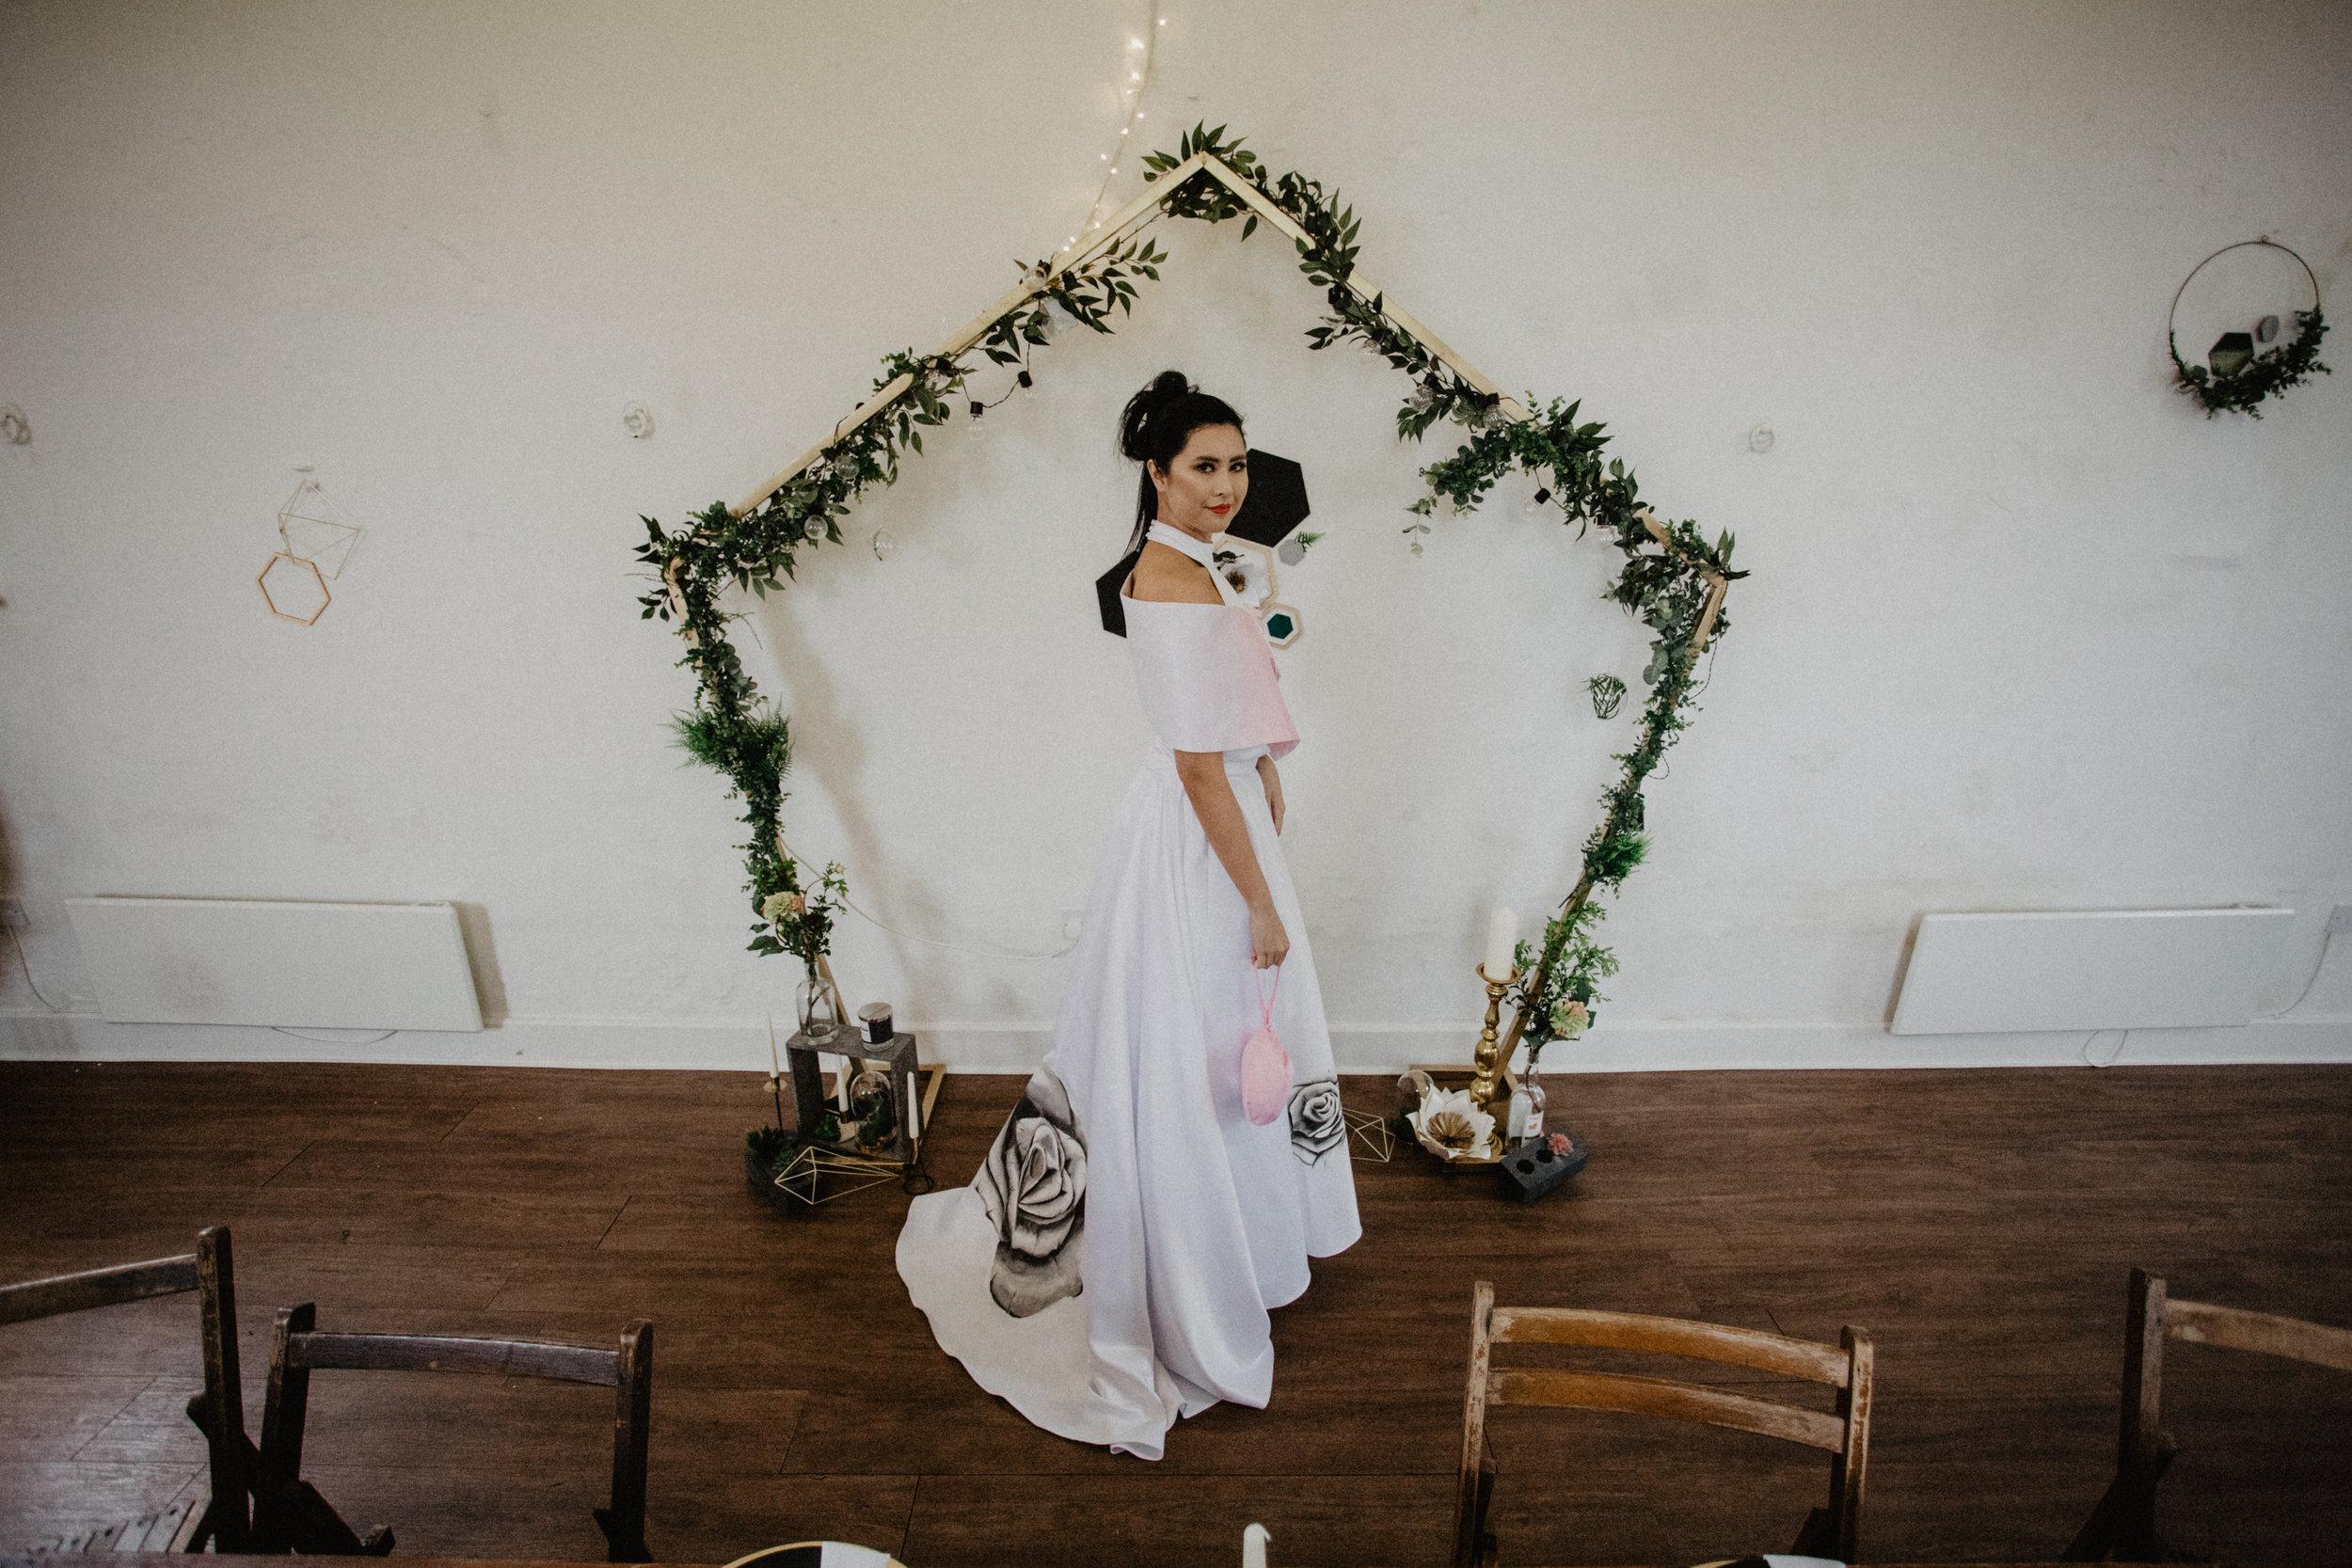 Urban Wedding Shoot- The Unconventional Wedding Festival